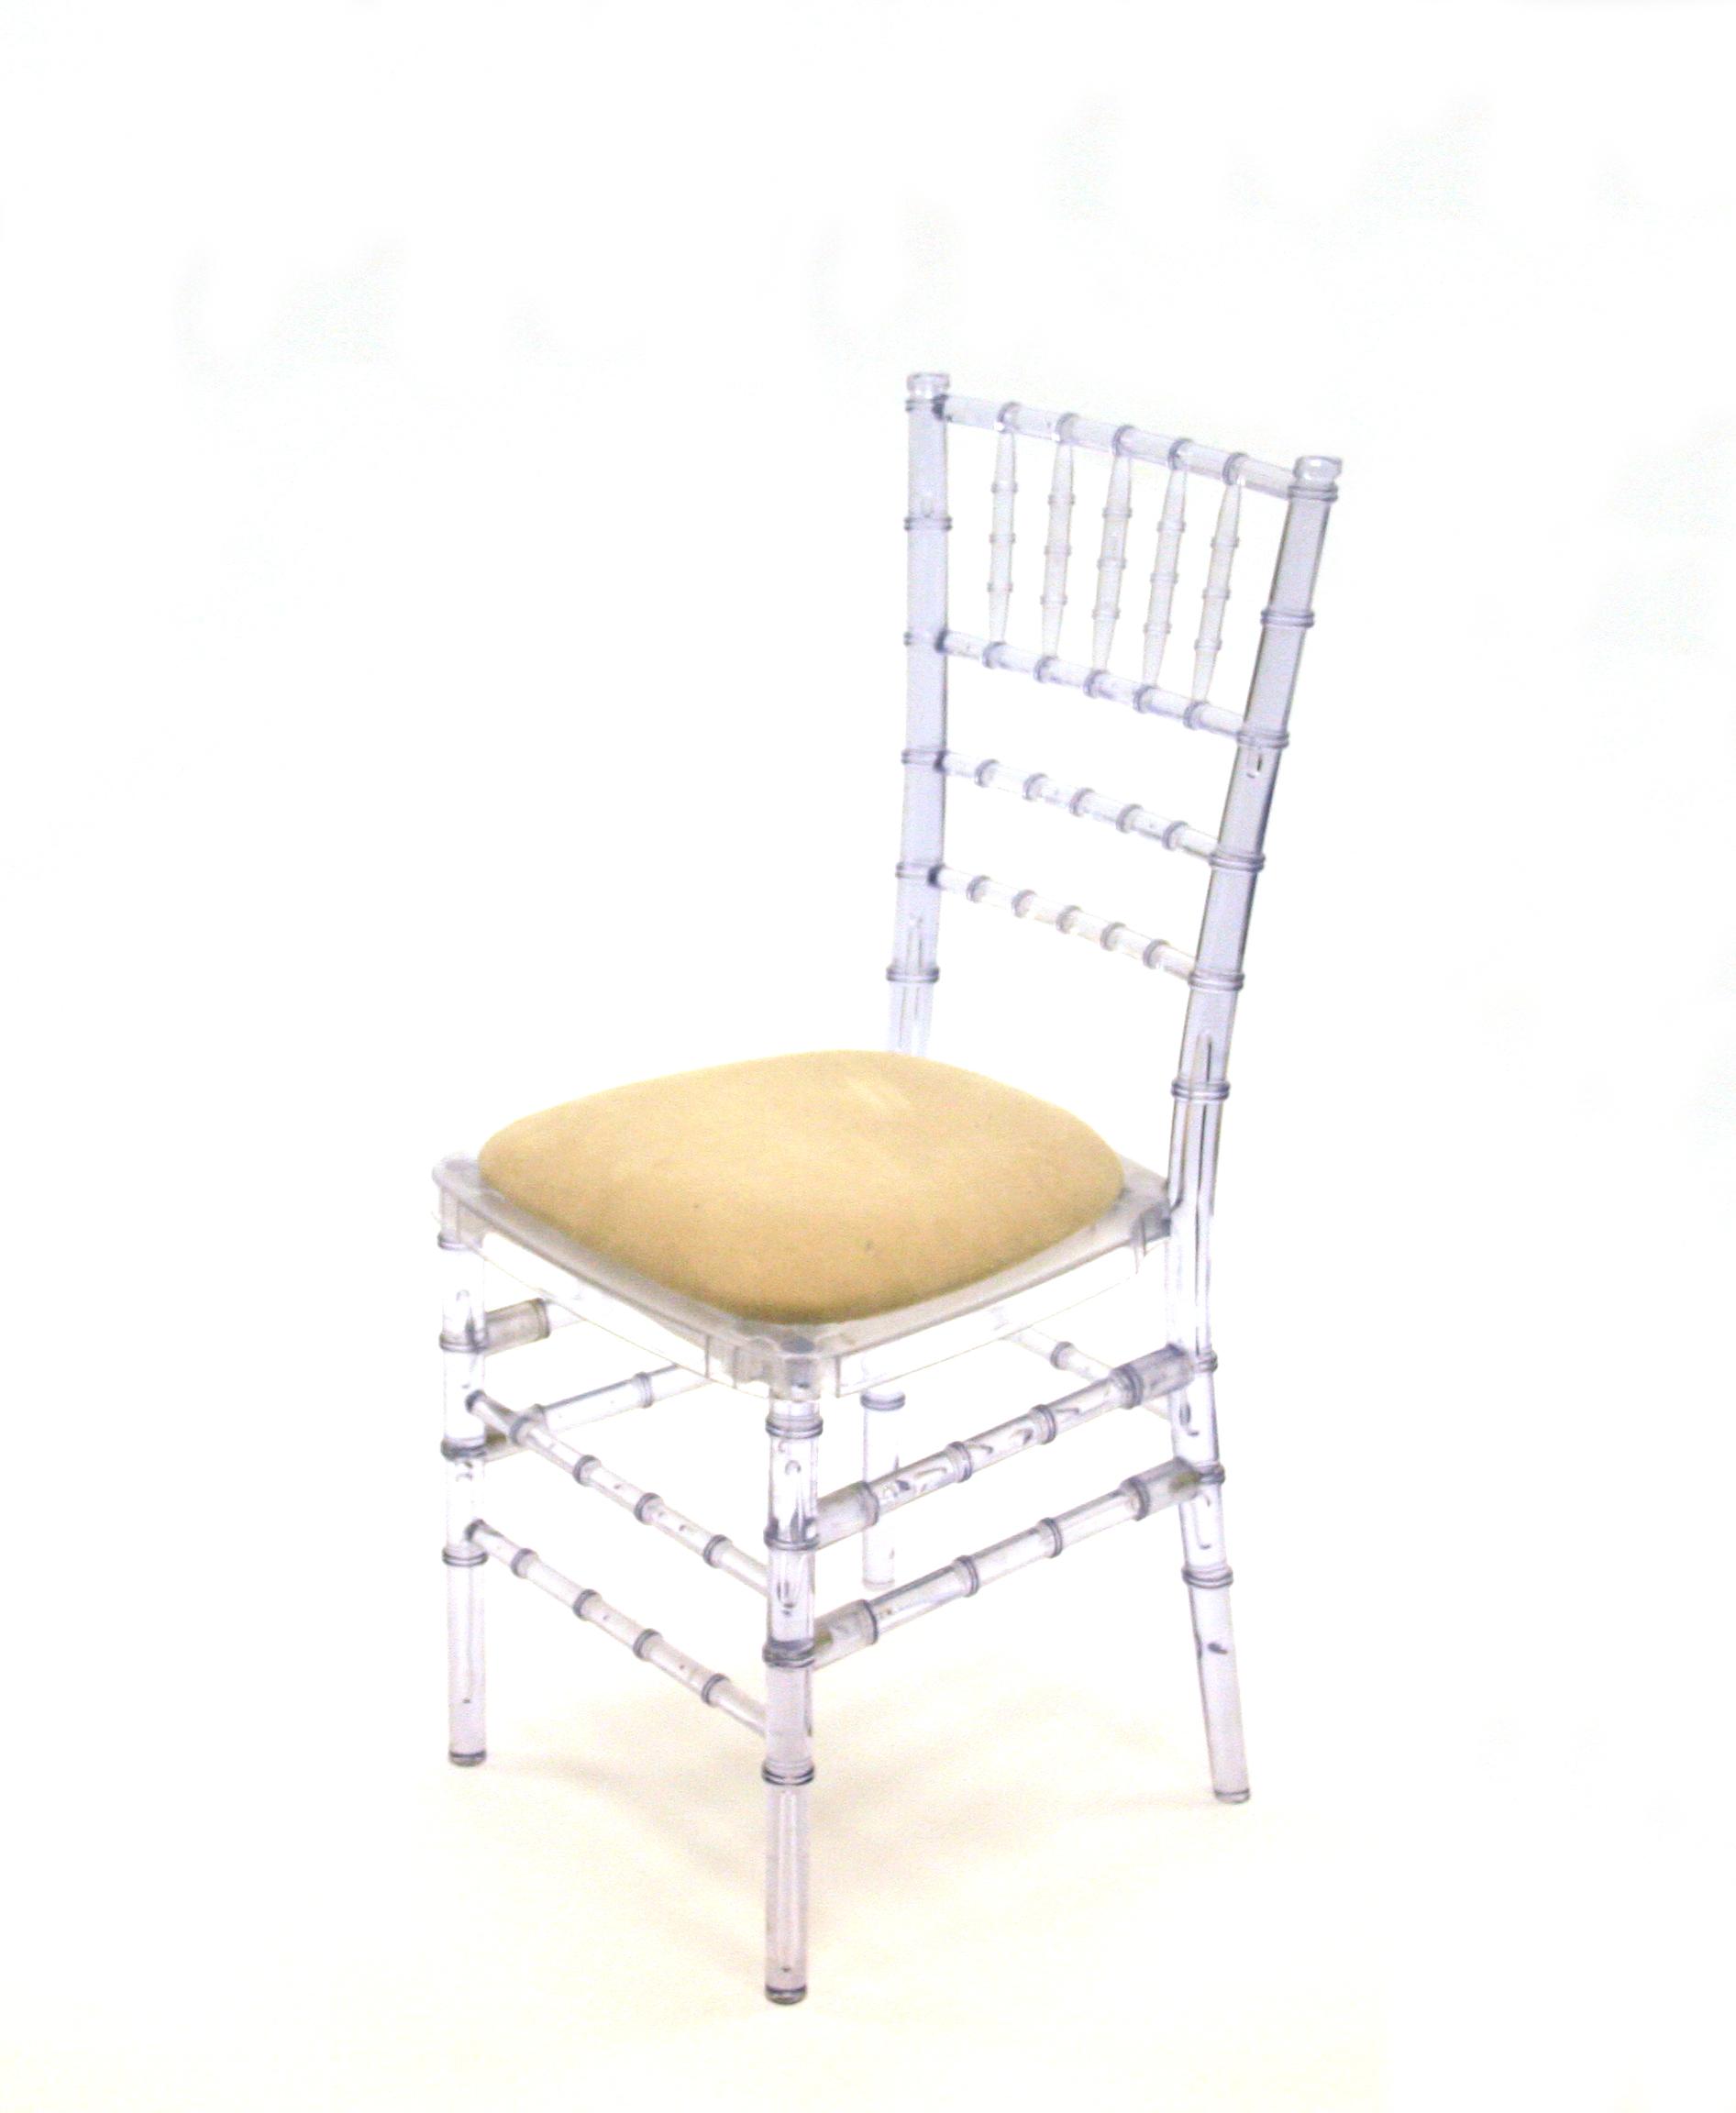 Crystal Resin Ice Krystal Chiavari Chairs - BE Event Hire